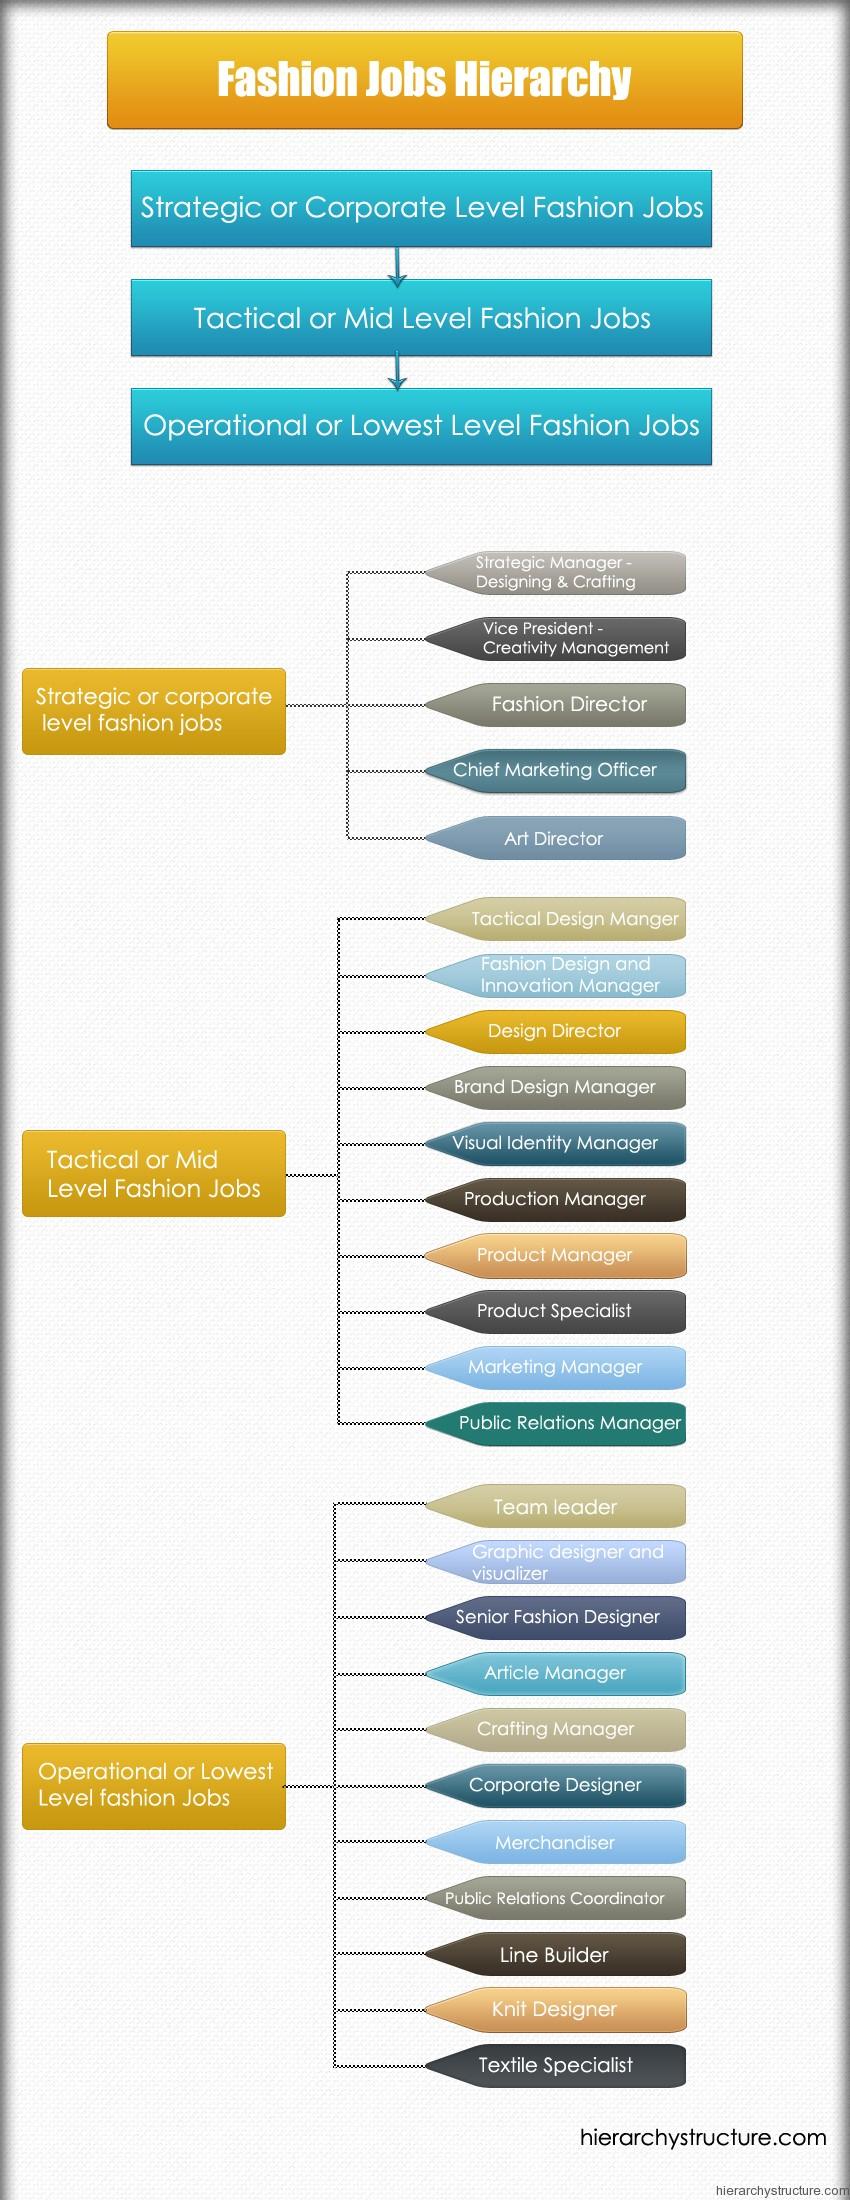 Fashion Jobs Hierarchy